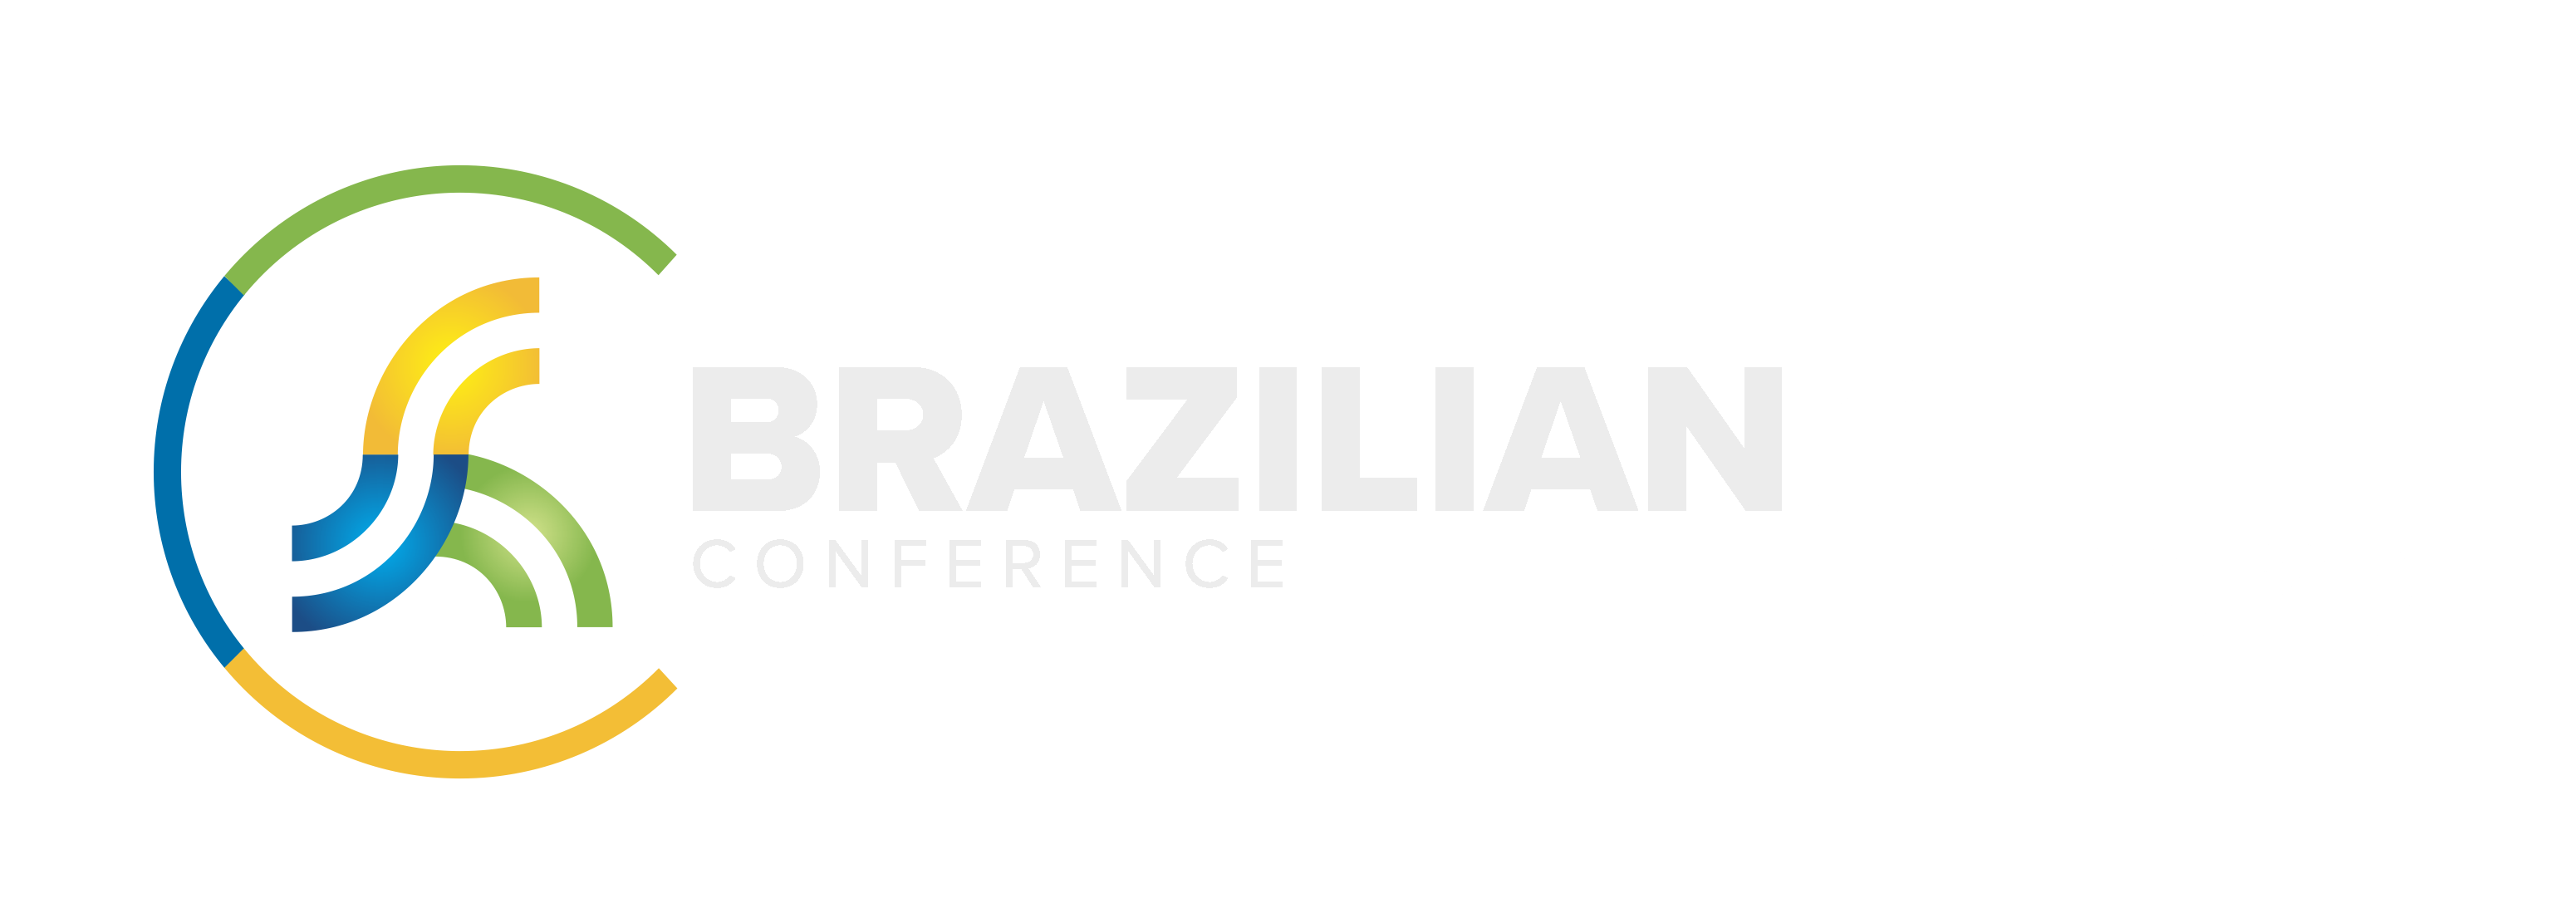 Brazilian Steel Conference 2020